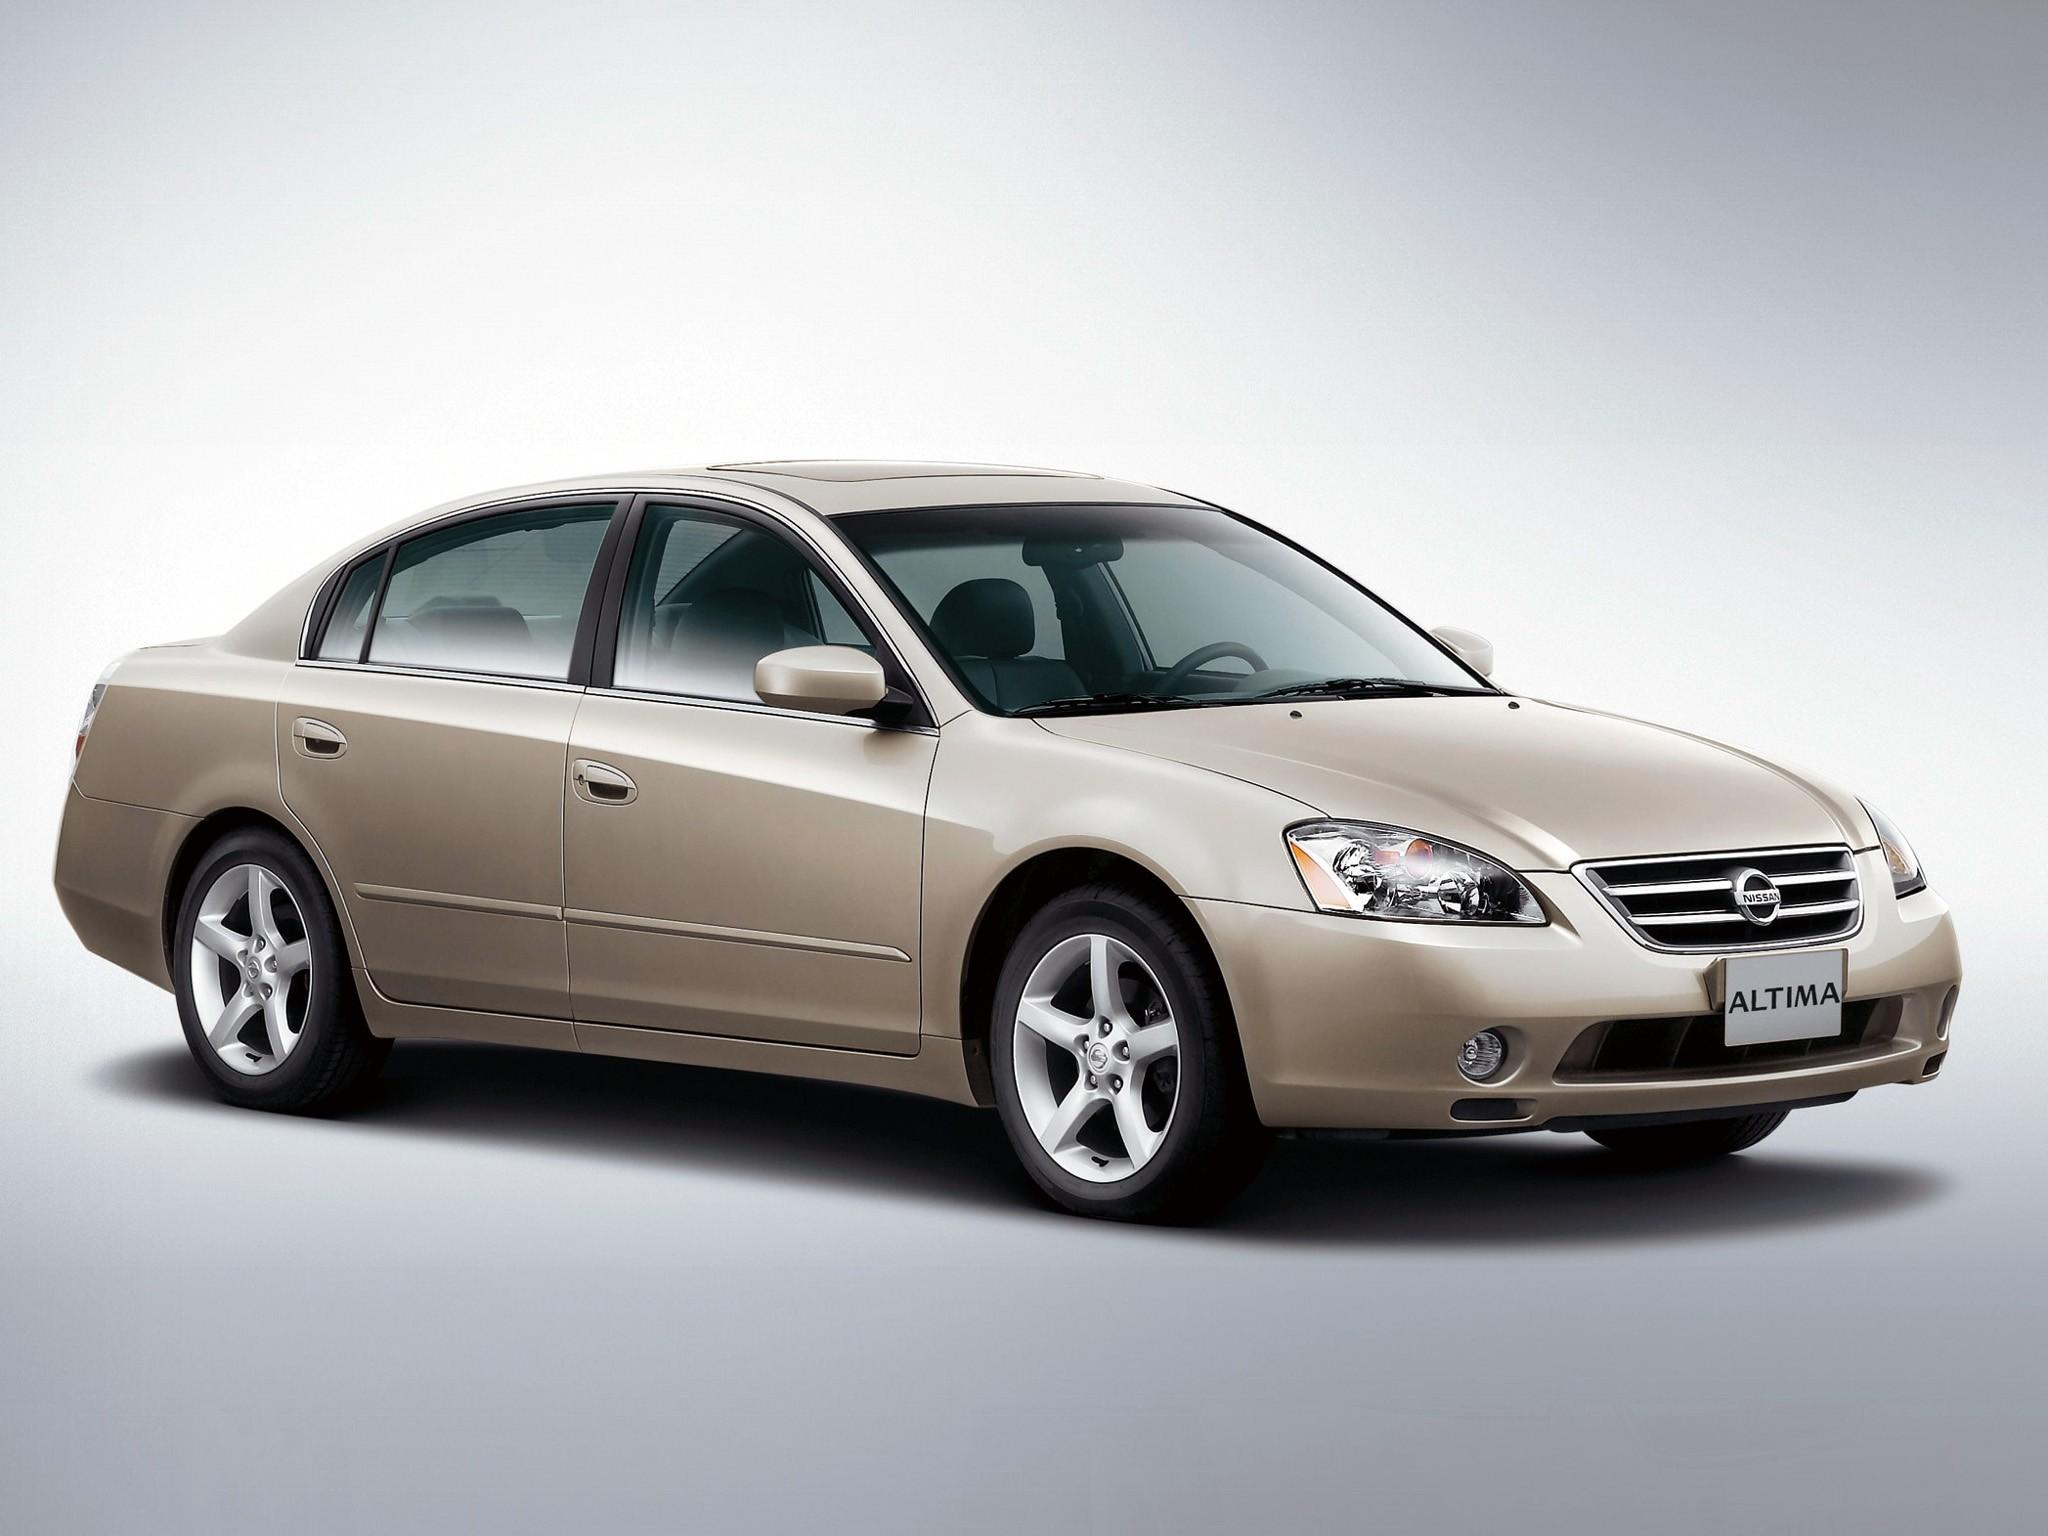 Nissan Altima 2002 2003 2004 2005 2006 Autoevolution